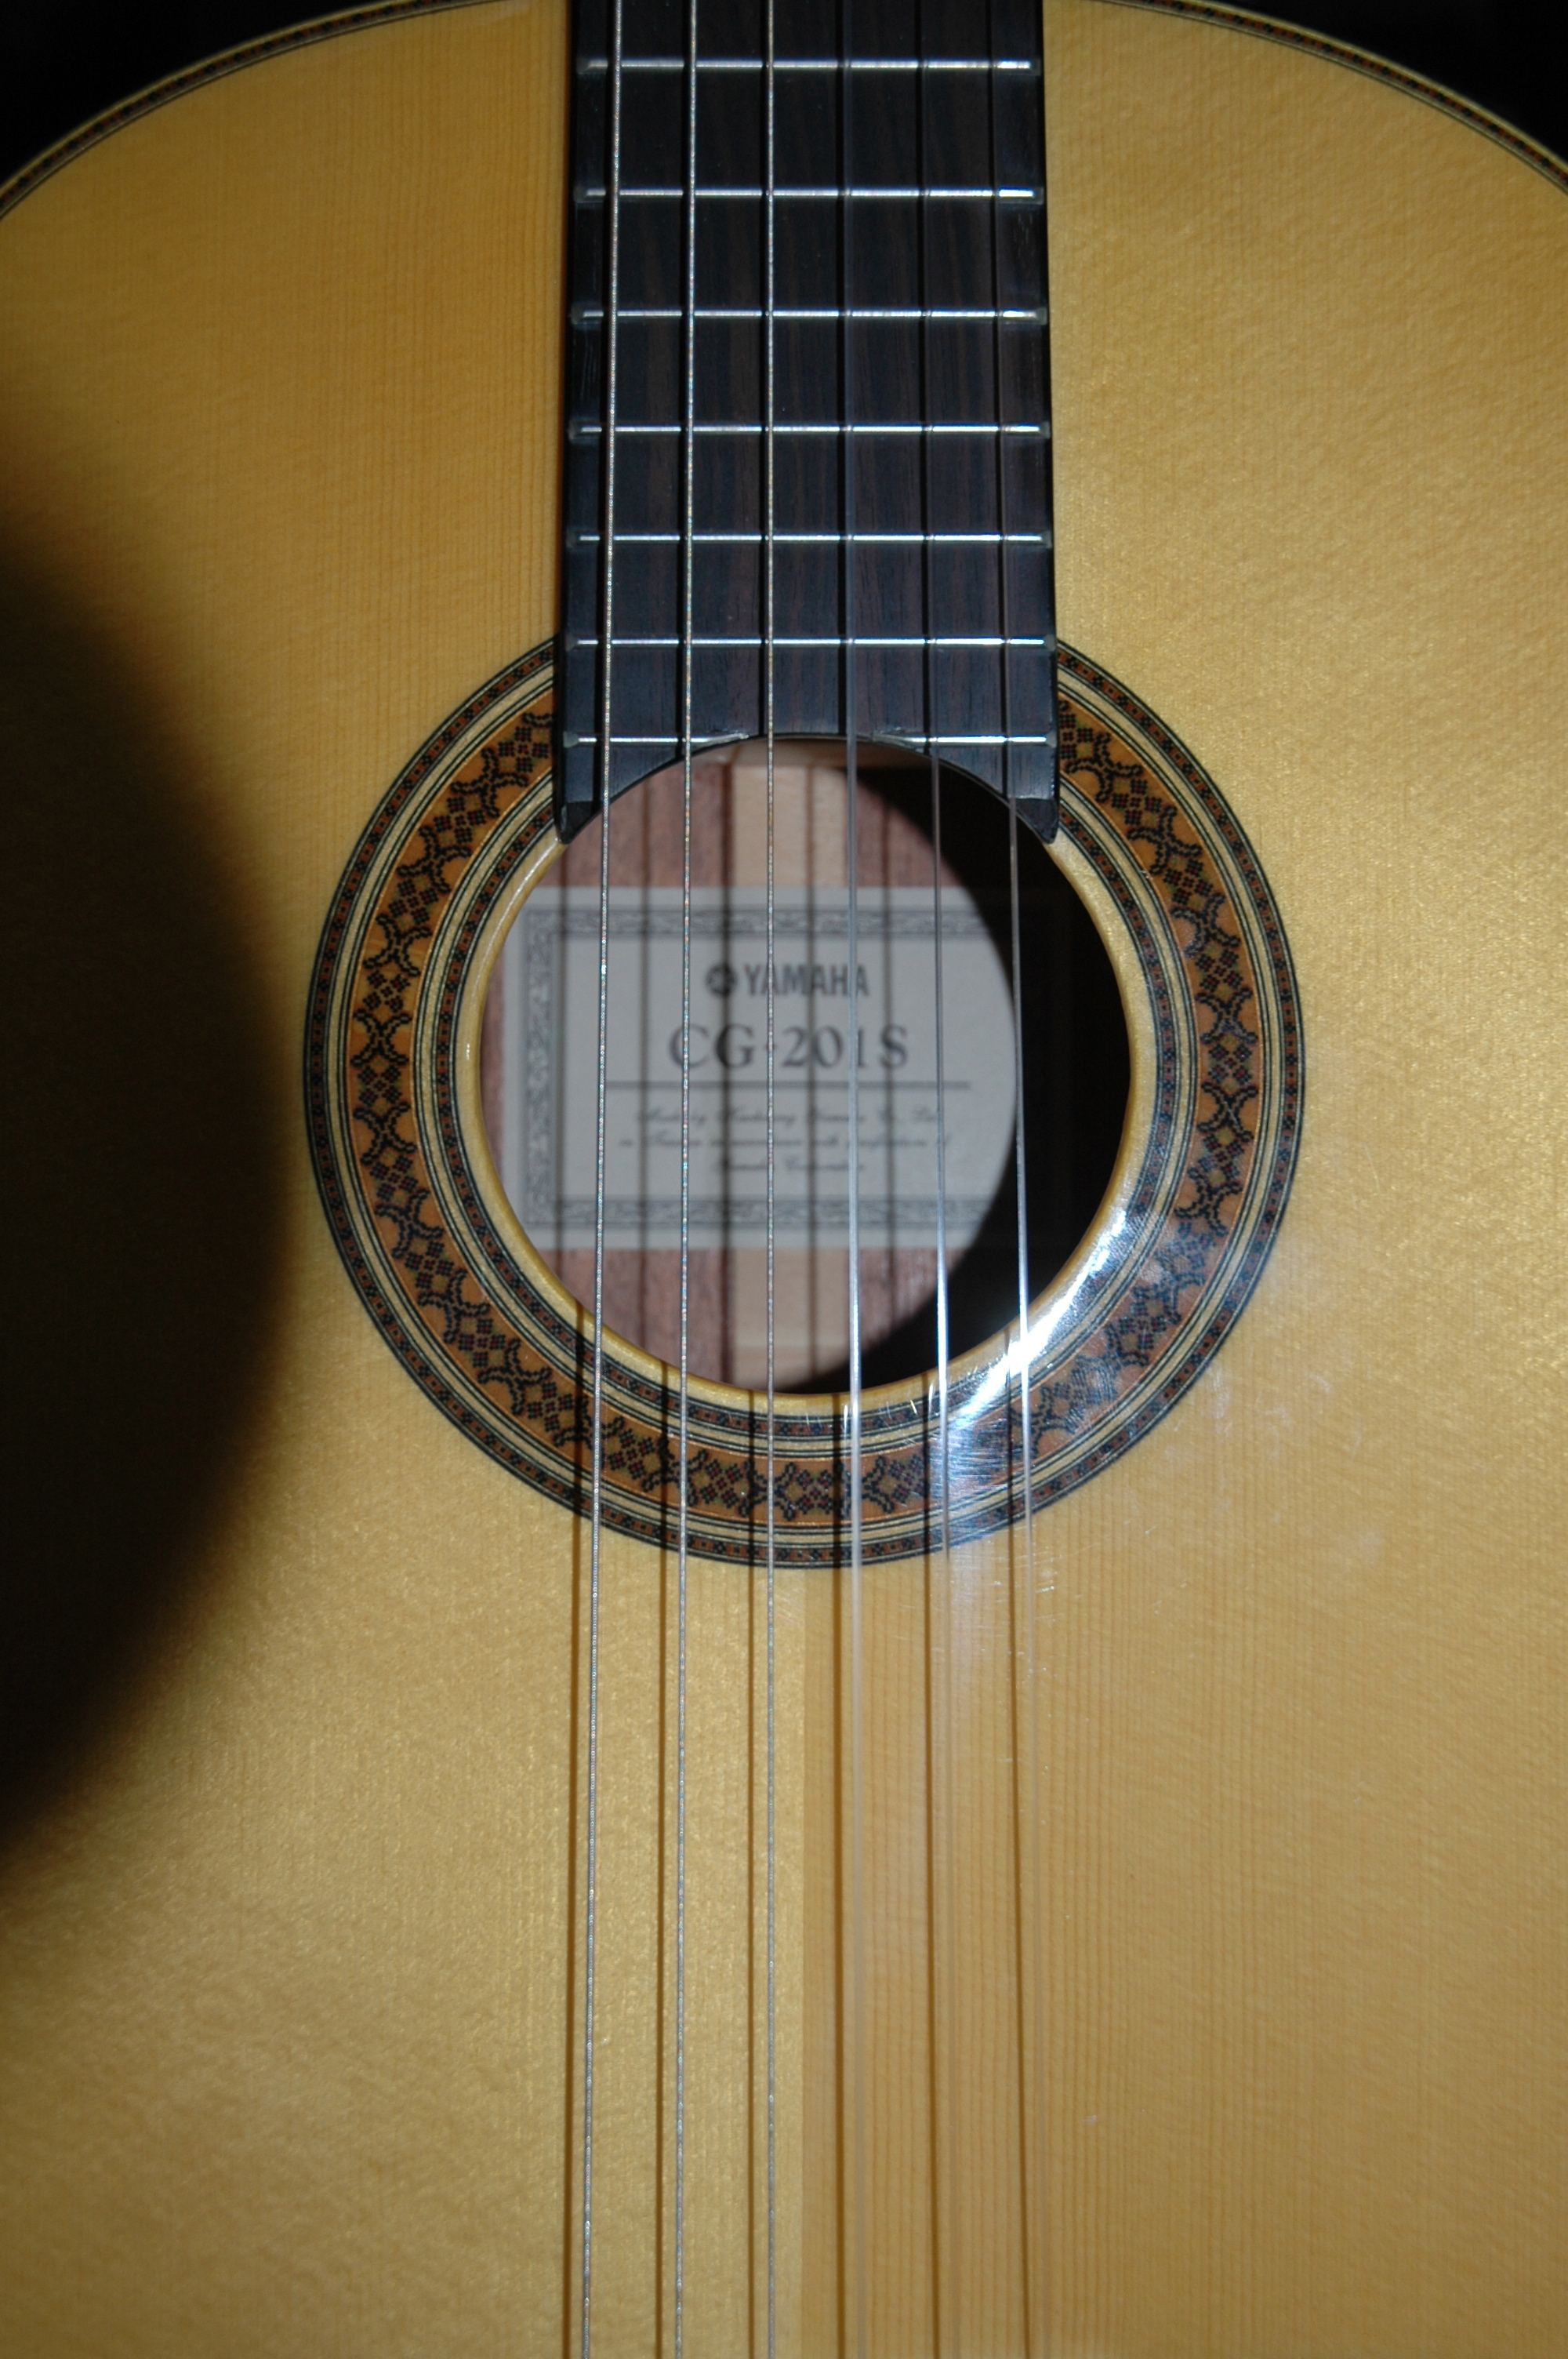 CG201S - Yamaha CG201S - Audiofanzine